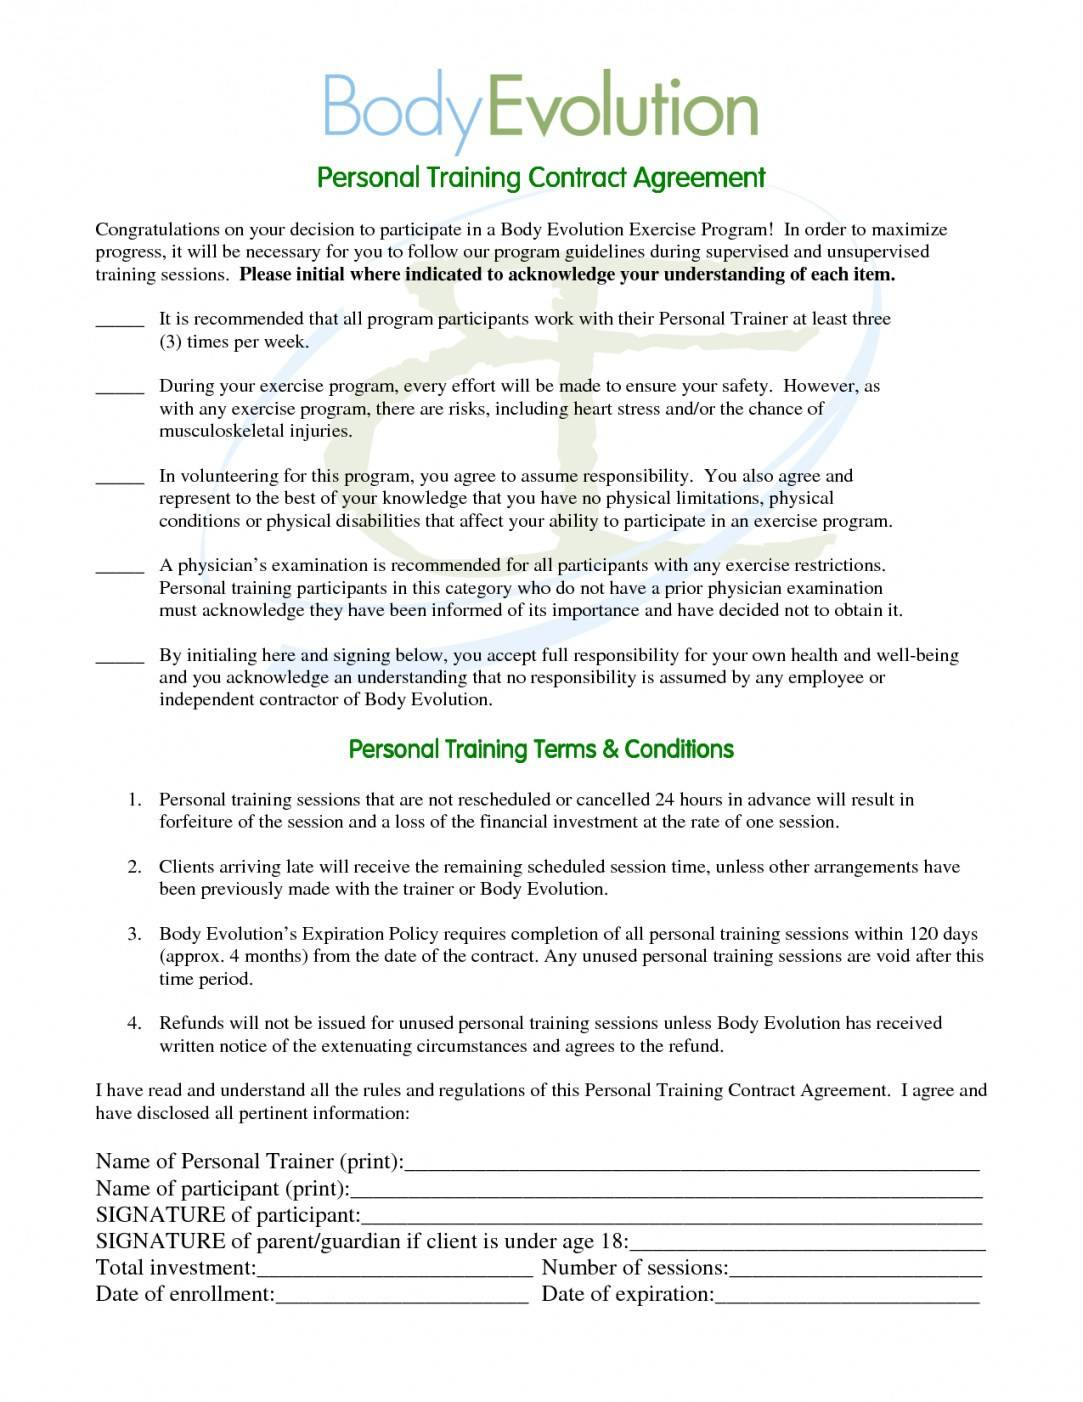 Sample Employee Training Contract Agreement